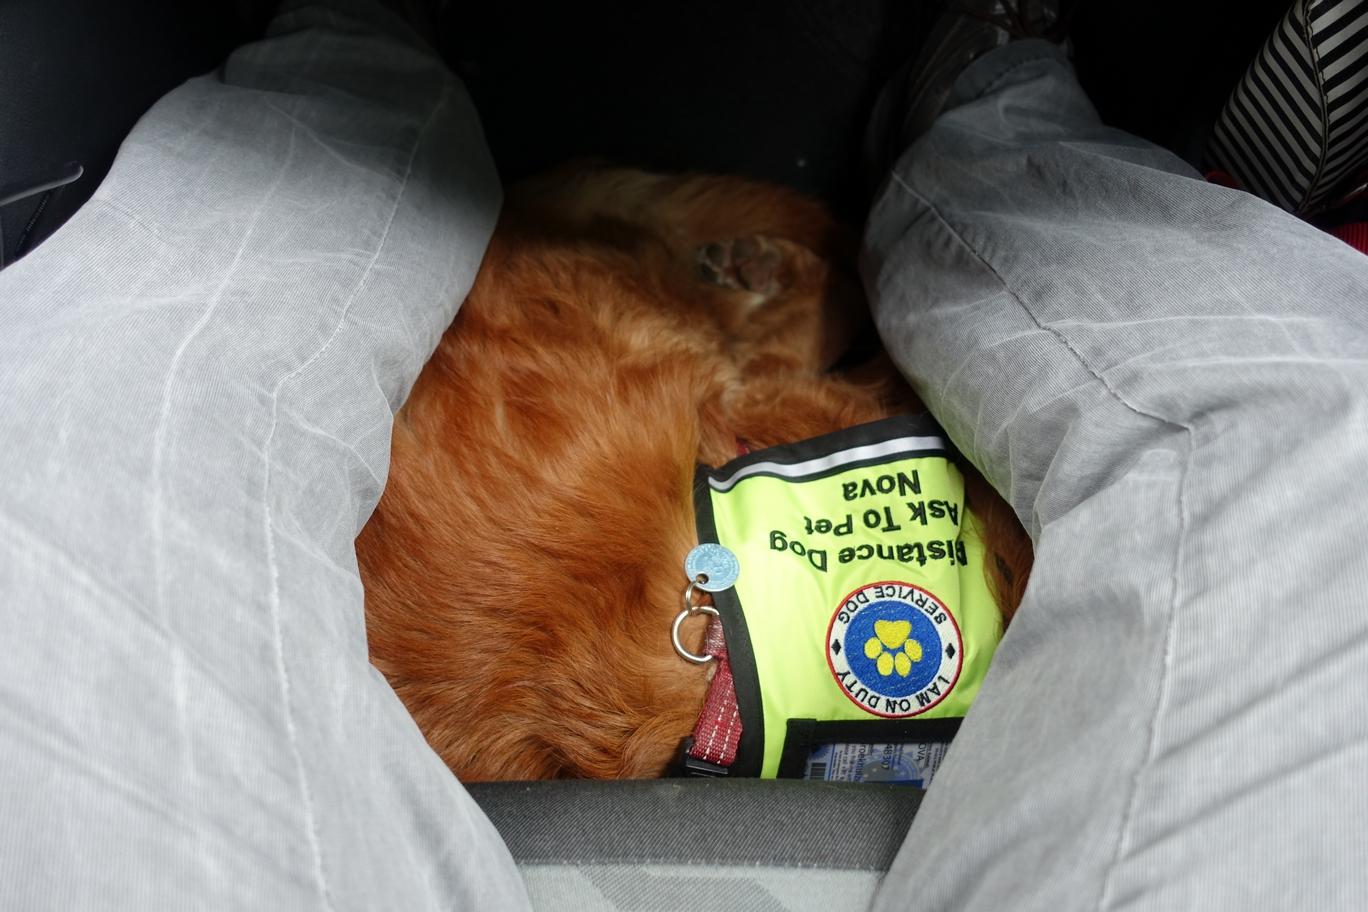 Nova in de auto